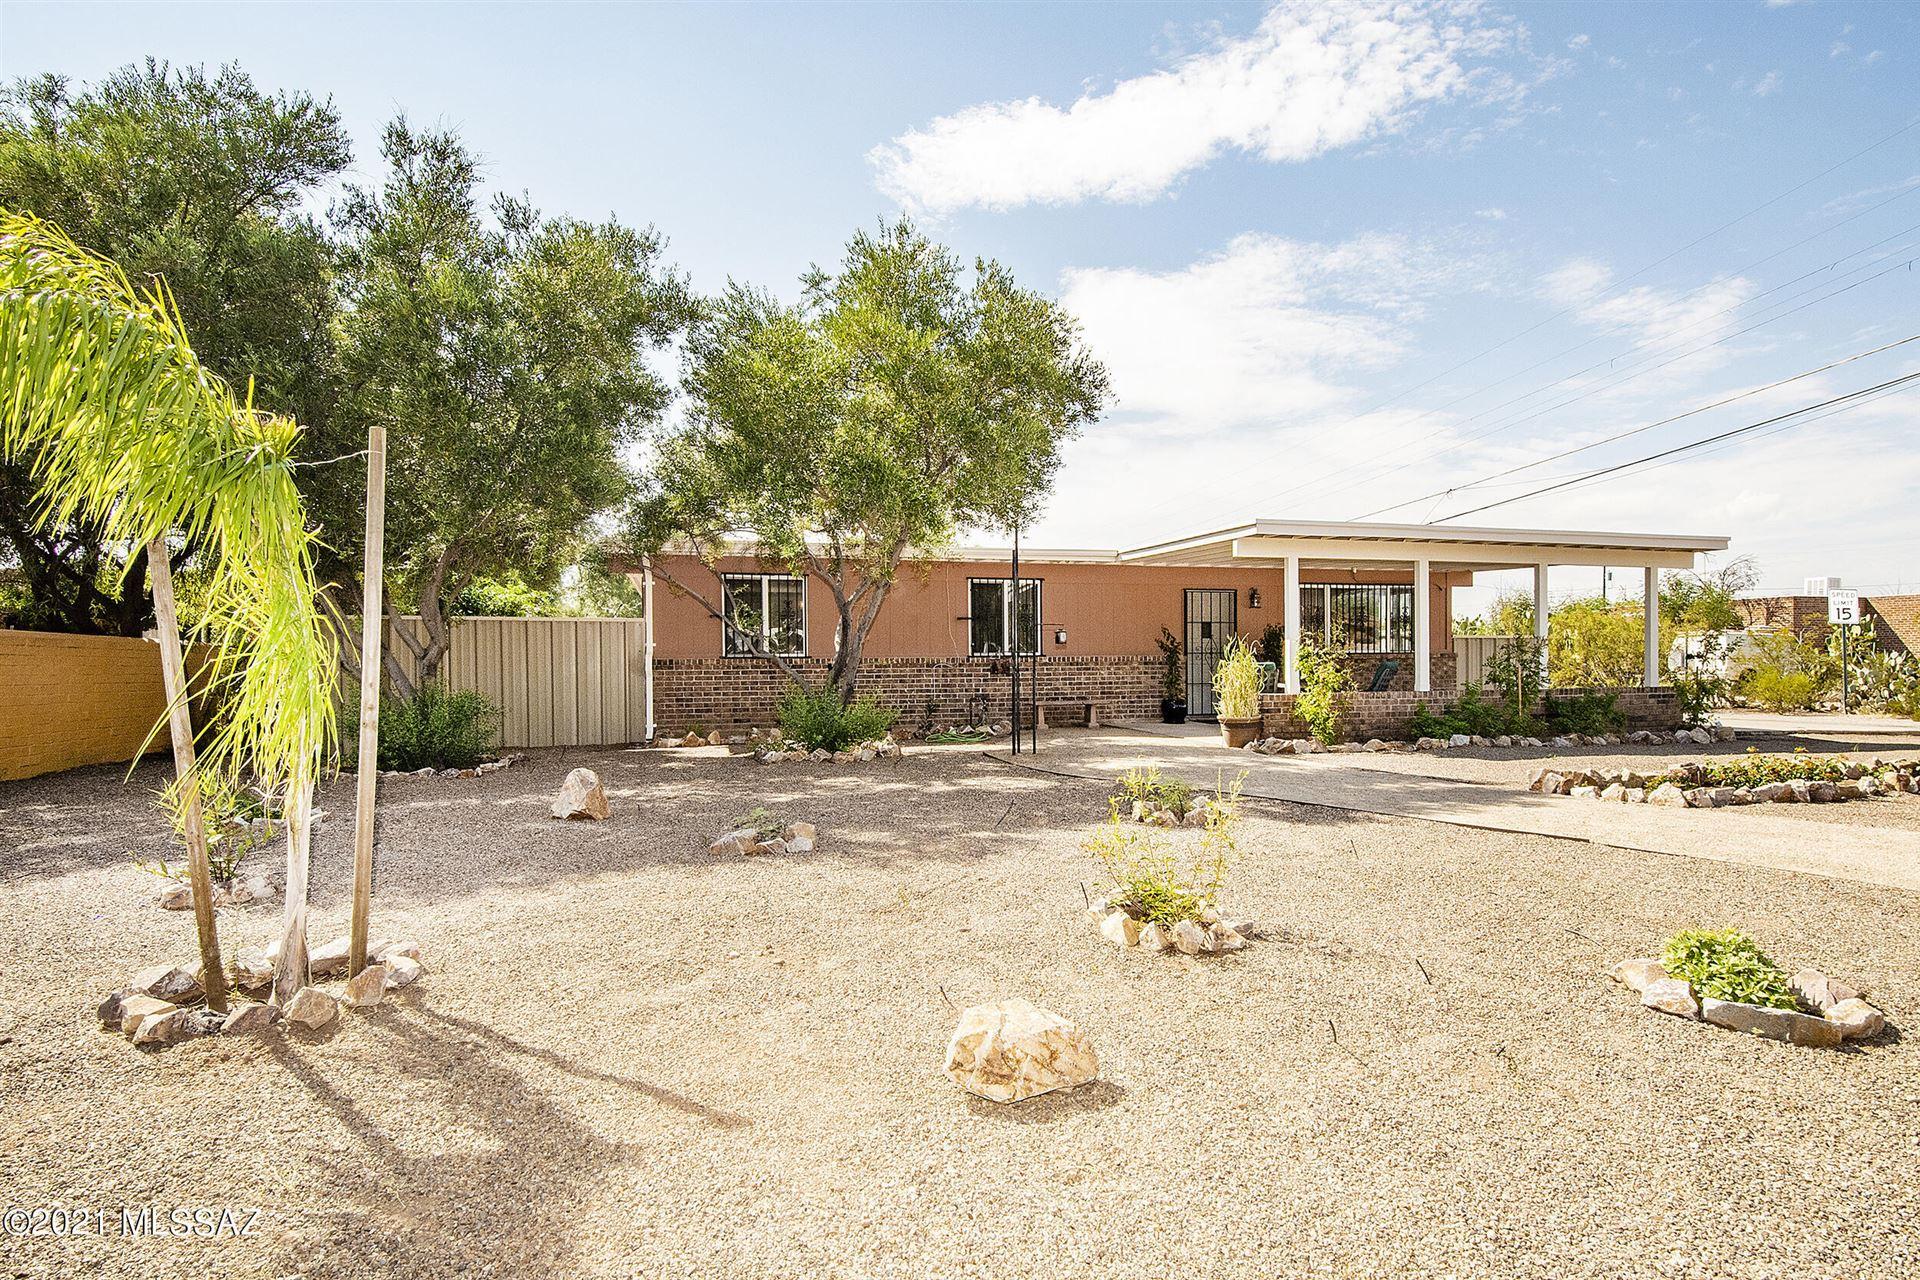 3019 N Fremont Avenue, Tucson, AZ 85719 - MLS#: 22124205